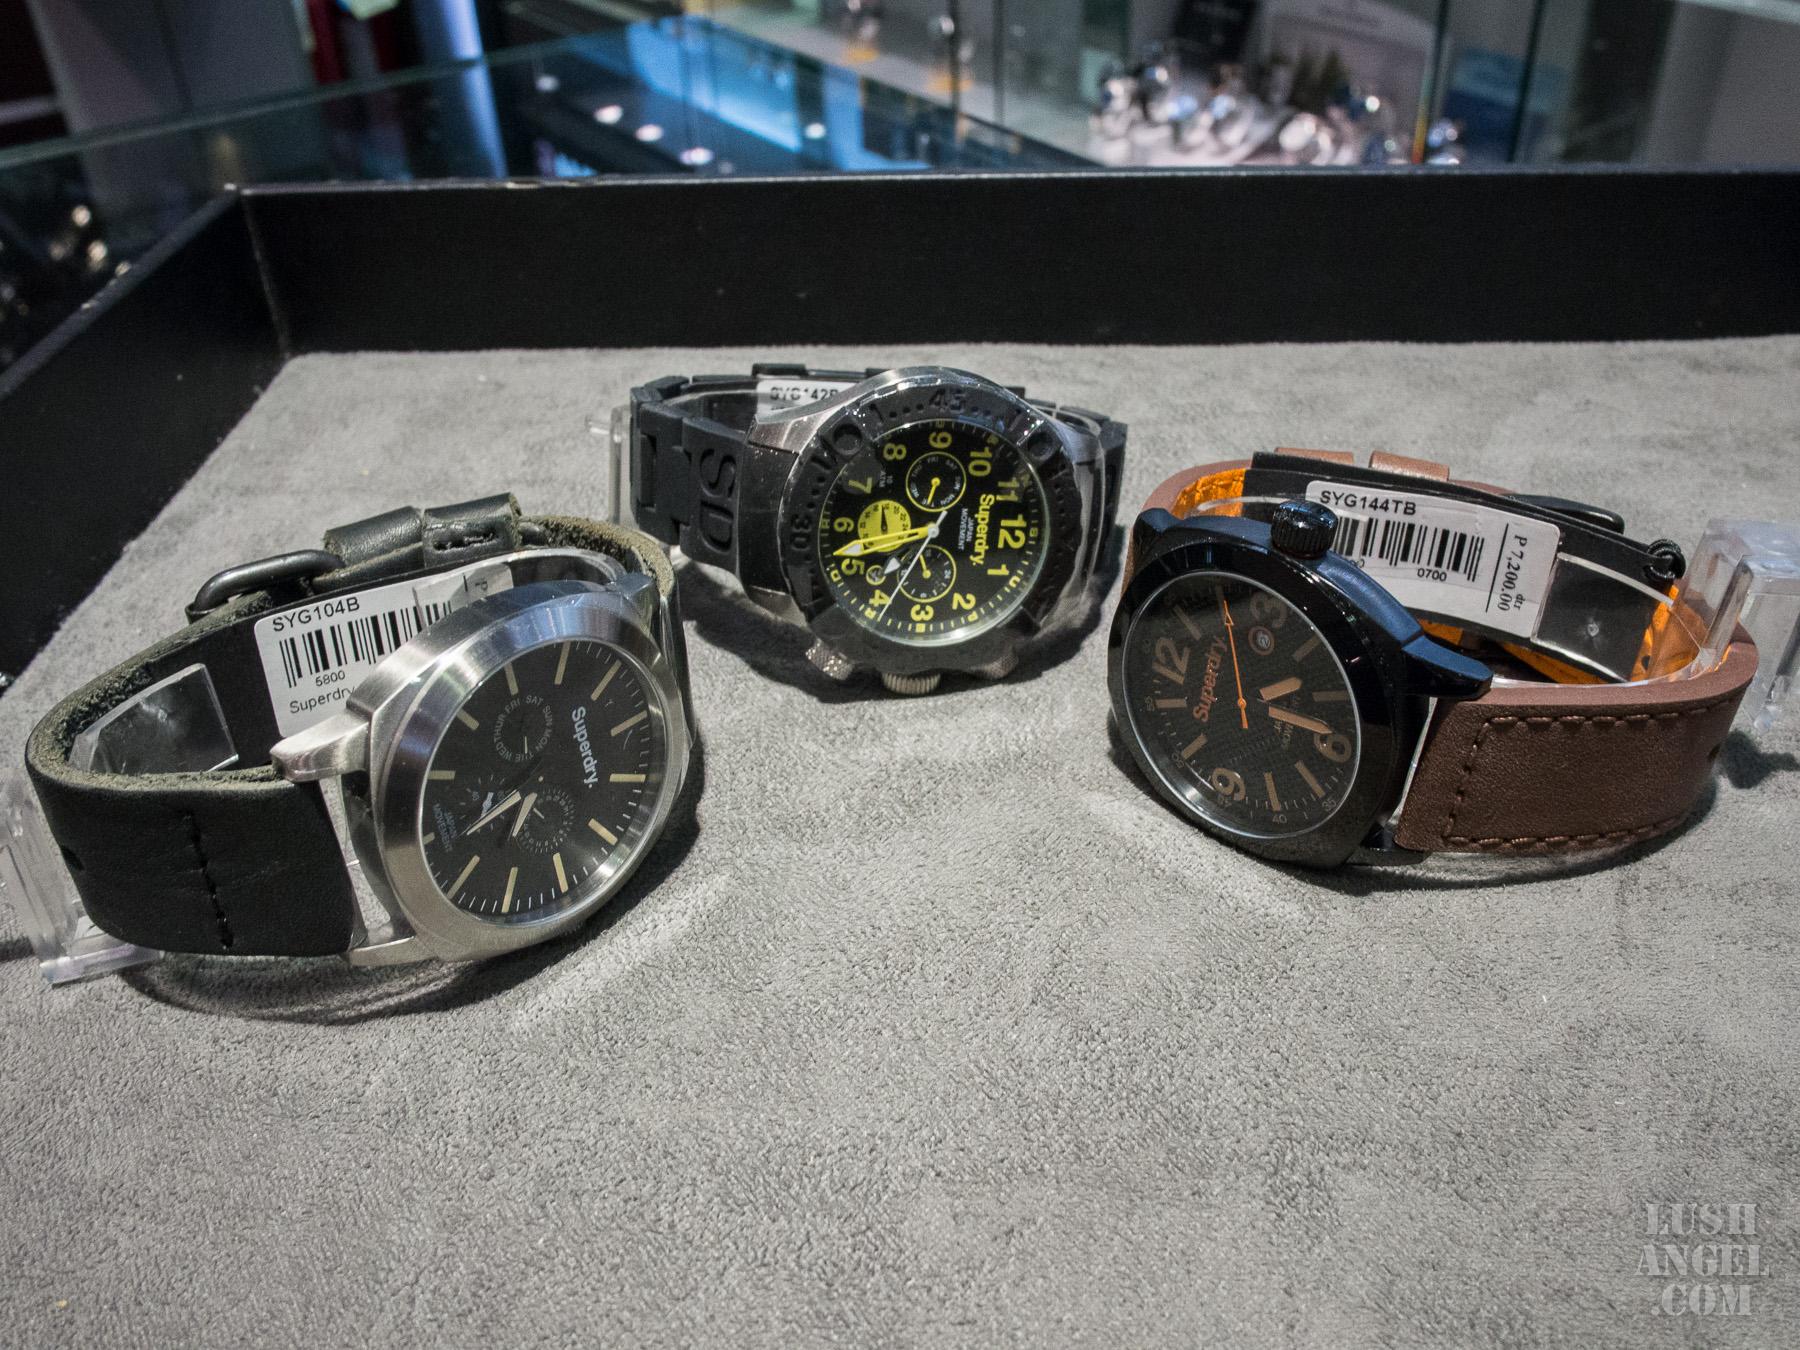 superdry-watch